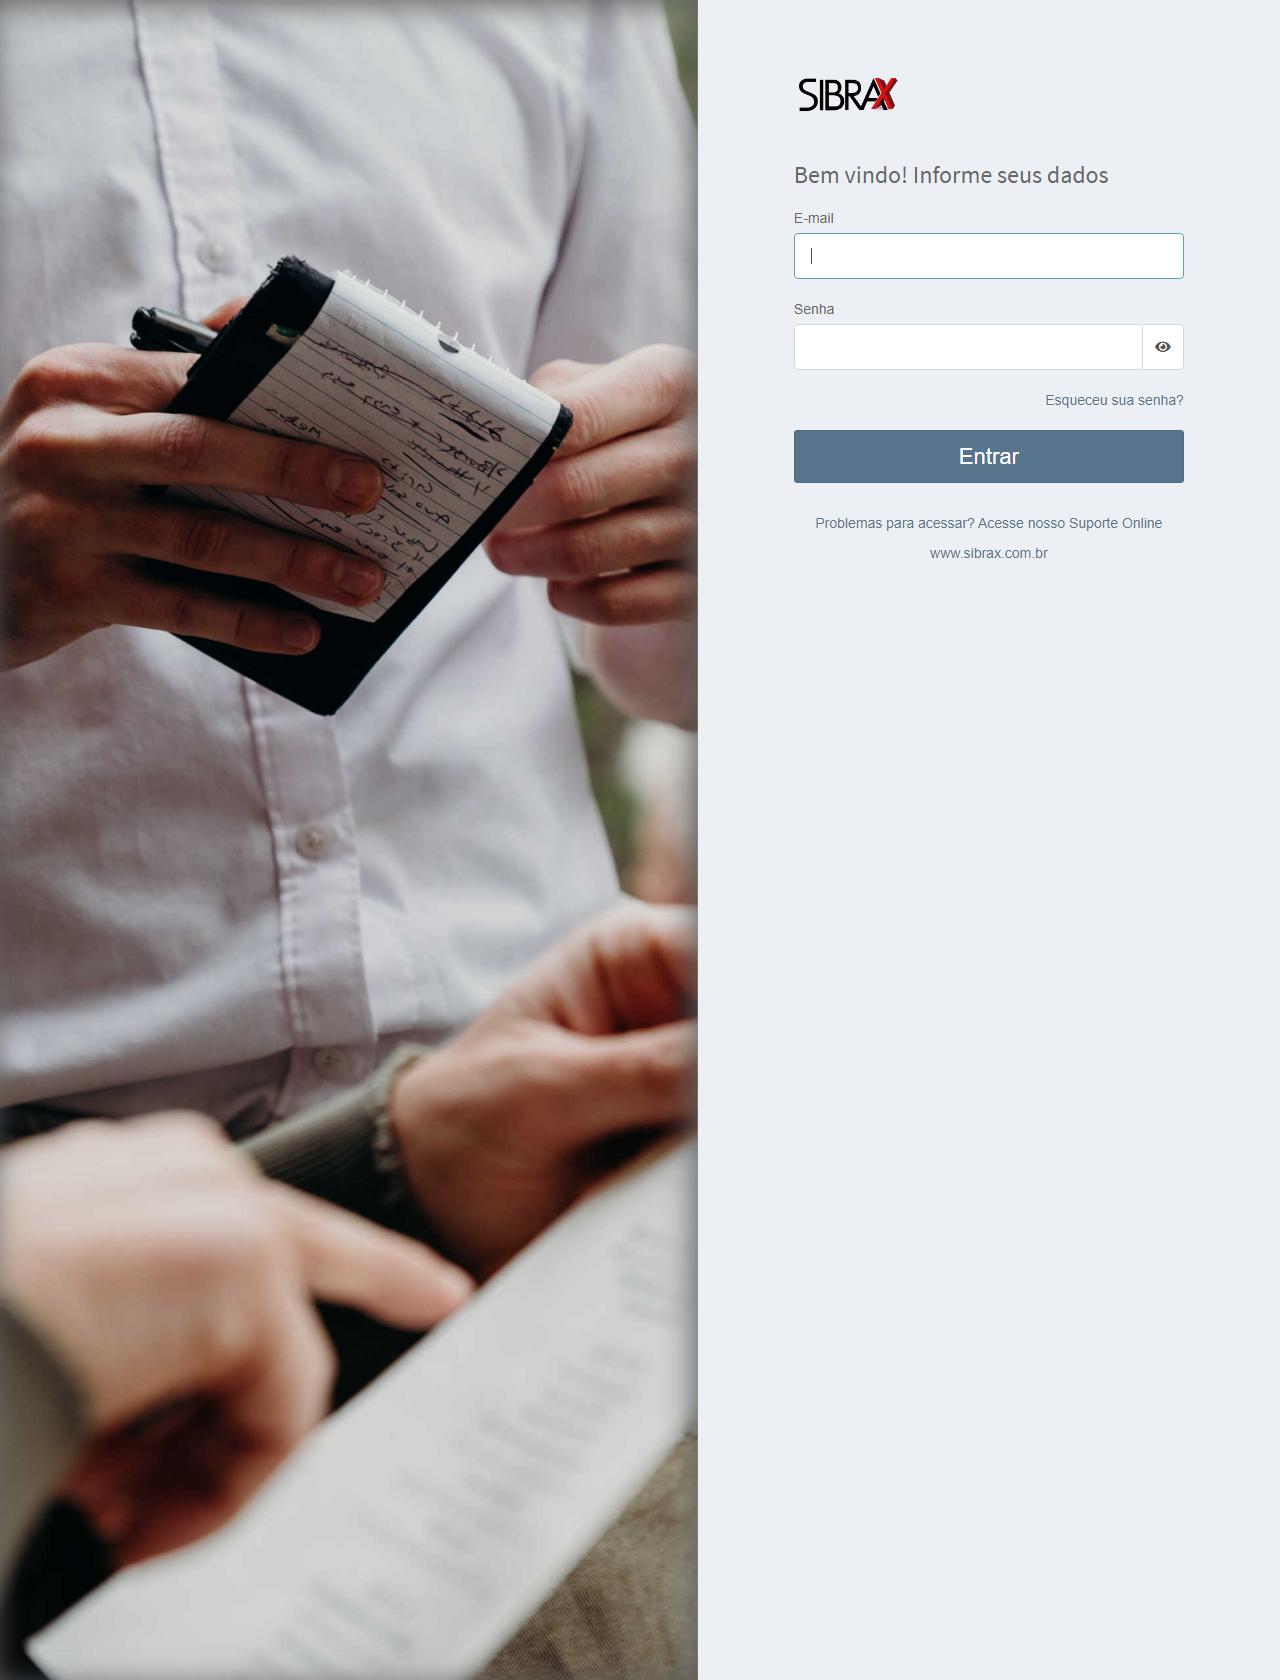 Screenshot Desktop - https://emissor.sibrax.com.br/app/entrar